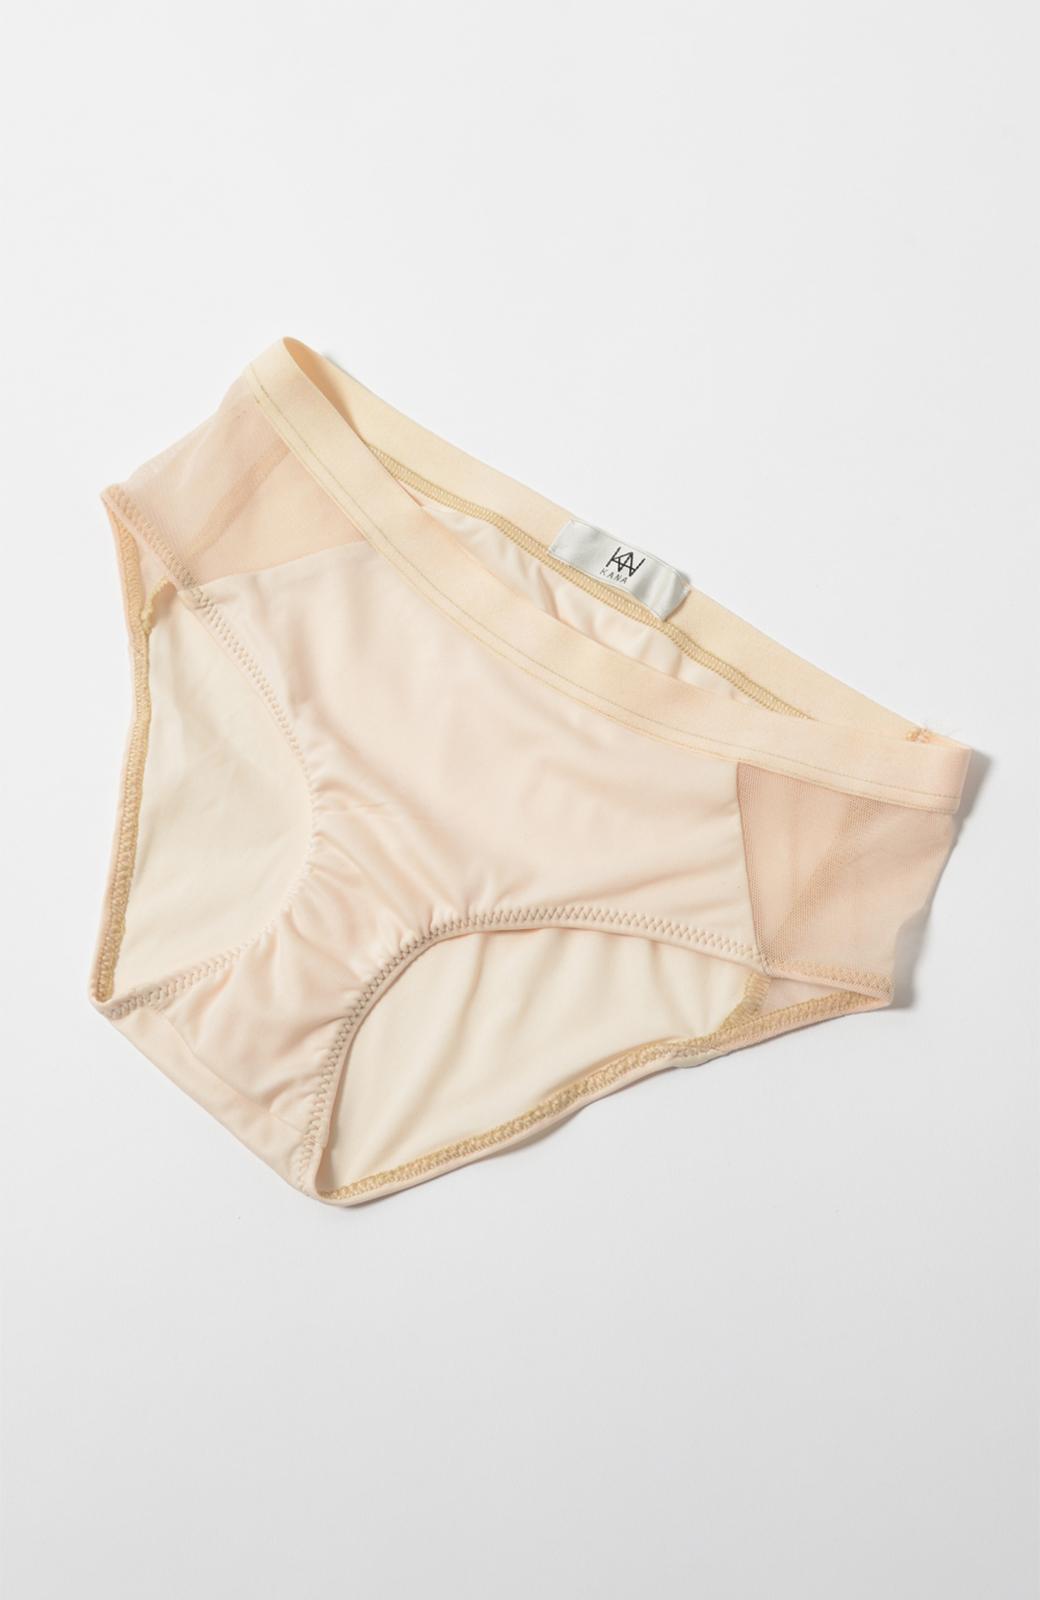 haco! てとひとて KANA MATSUNAMI  AIR shorts <ピンクベージュ>の商品写真2